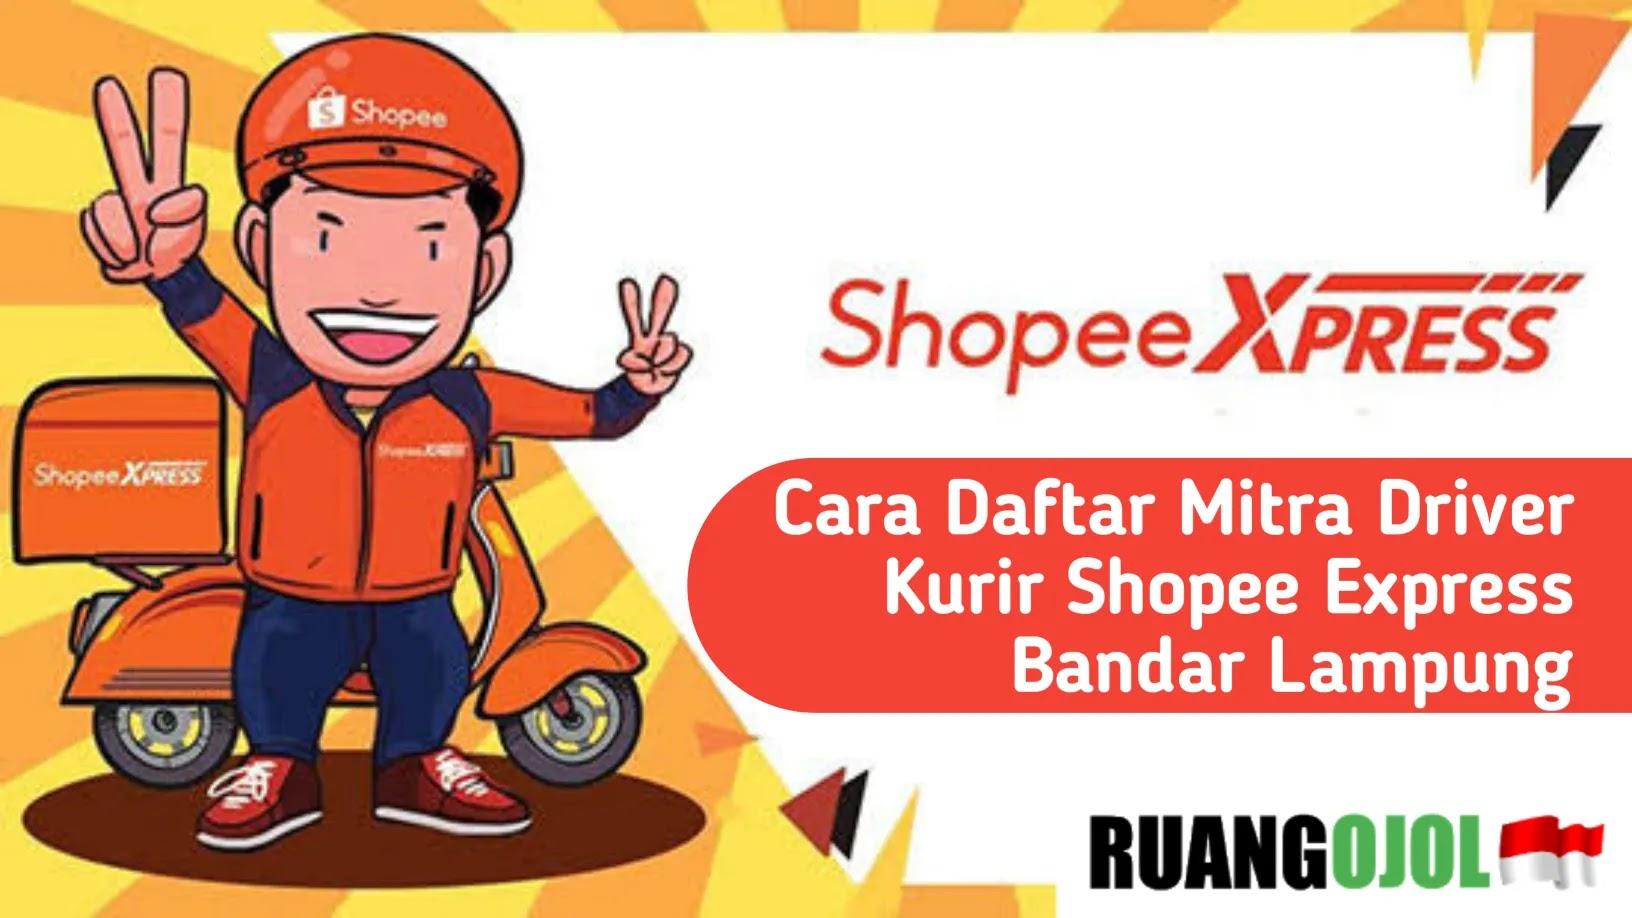 Cara Daftar Mitra Driver Kurir Shopee Express Bandar Lampung